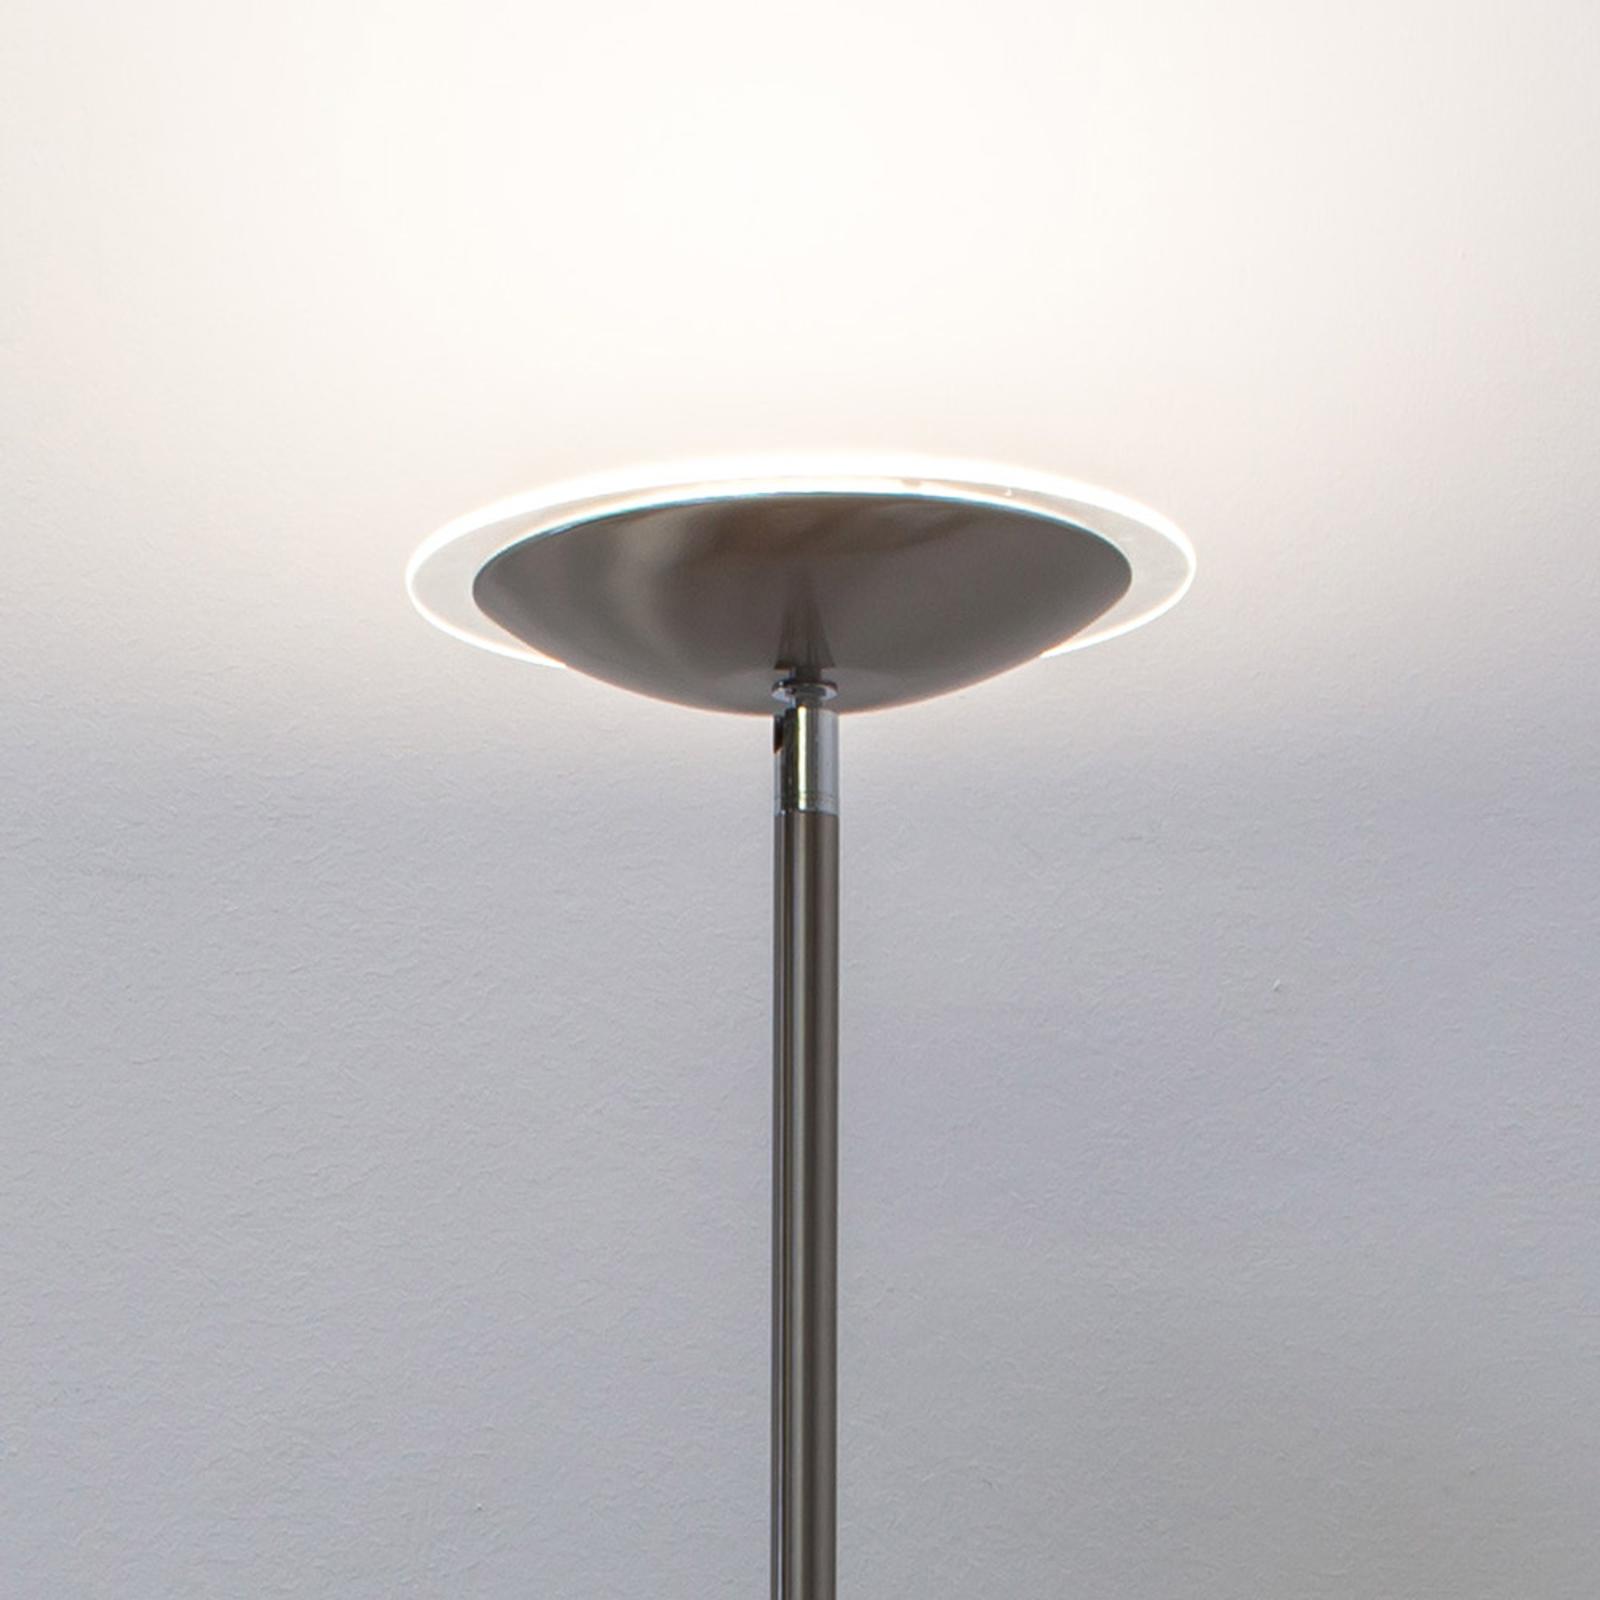 Malea - lampadaire indirect LED, nickel mat